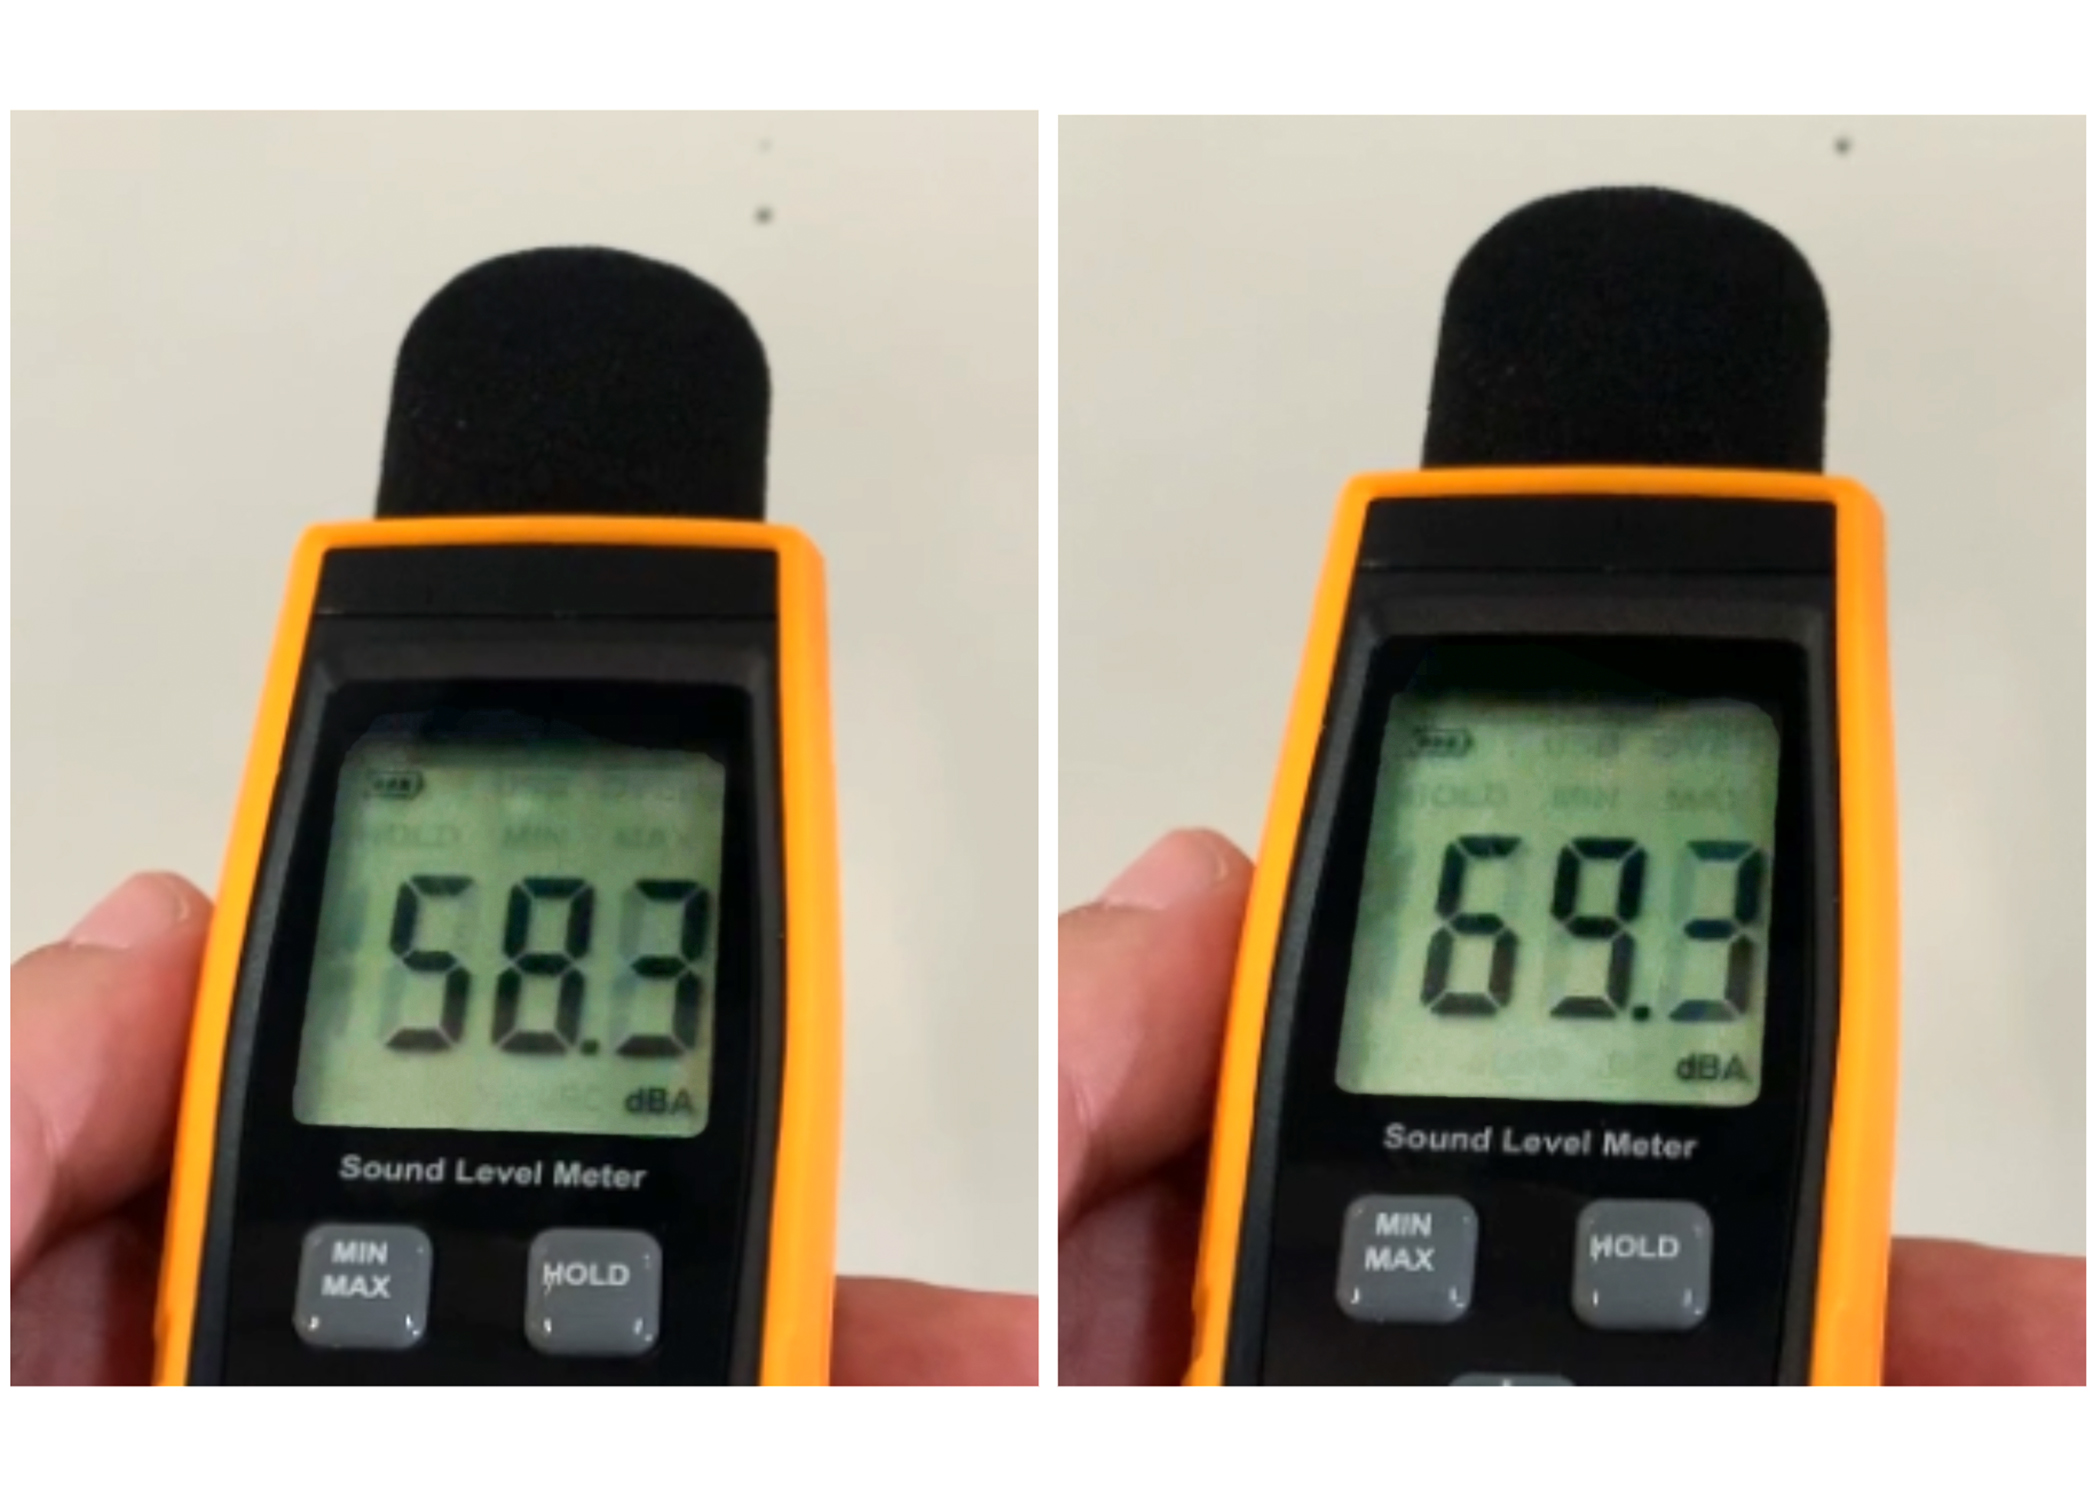 Two Decibel Meters Displaying Sound Levels of Zeiss HFA 860